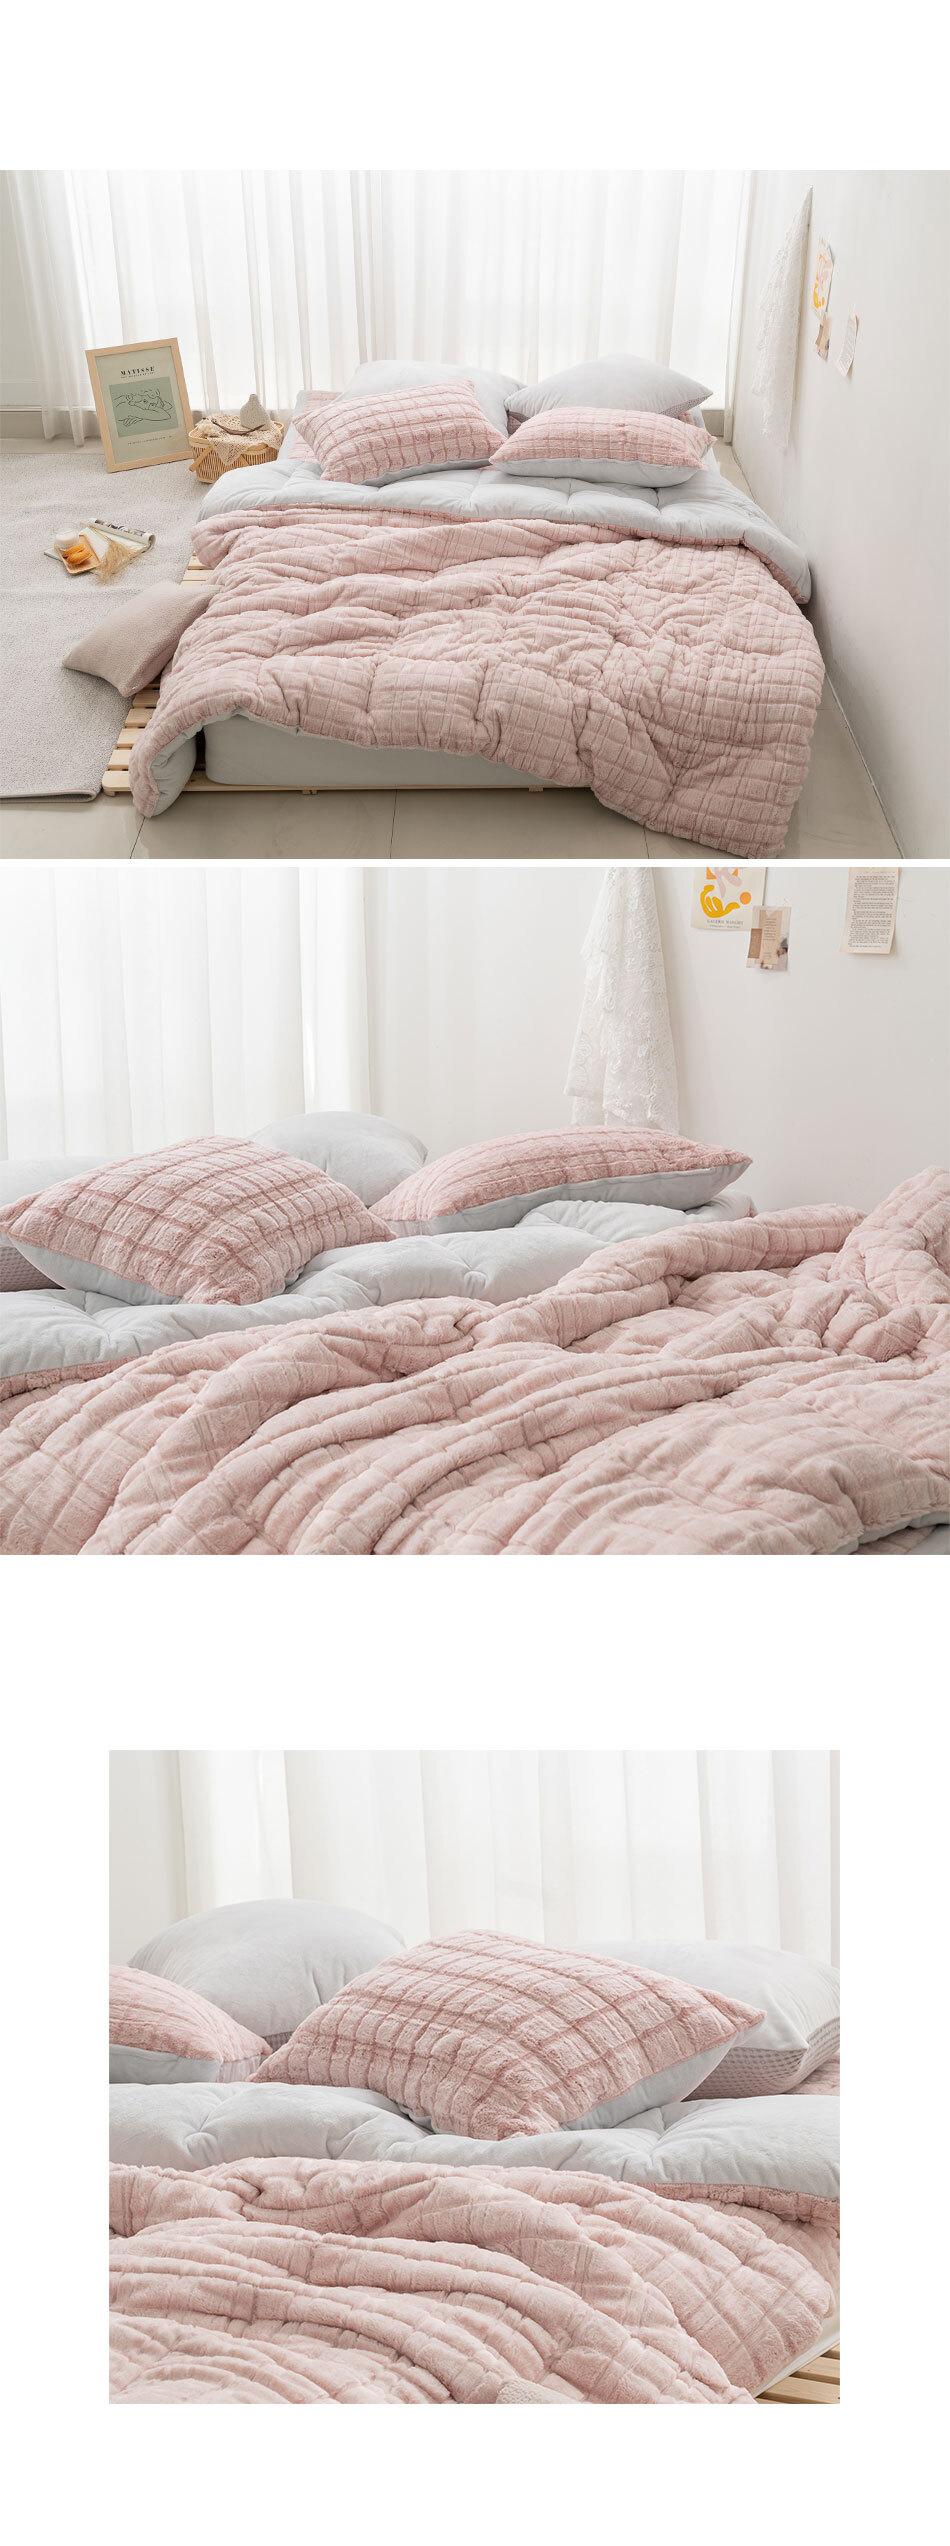 chou_bed_pink_01.jpg